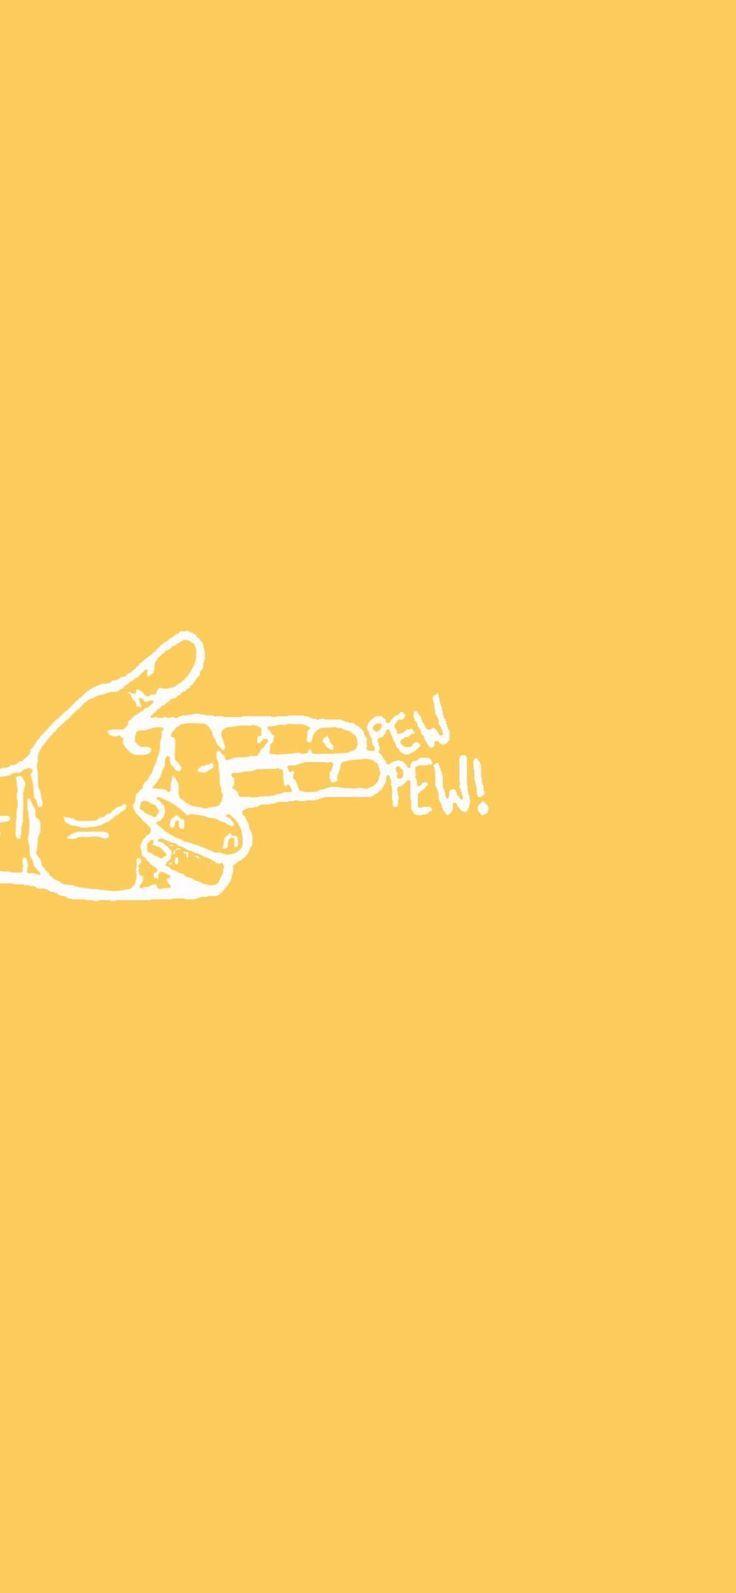 Yellow Aesthetic Wallpaper Quotes Yellow Aesthetic Wallpaper In 2020 Iphone Wallpaper Yellow Yellow Aesthetic Aesthetic Wallpapers